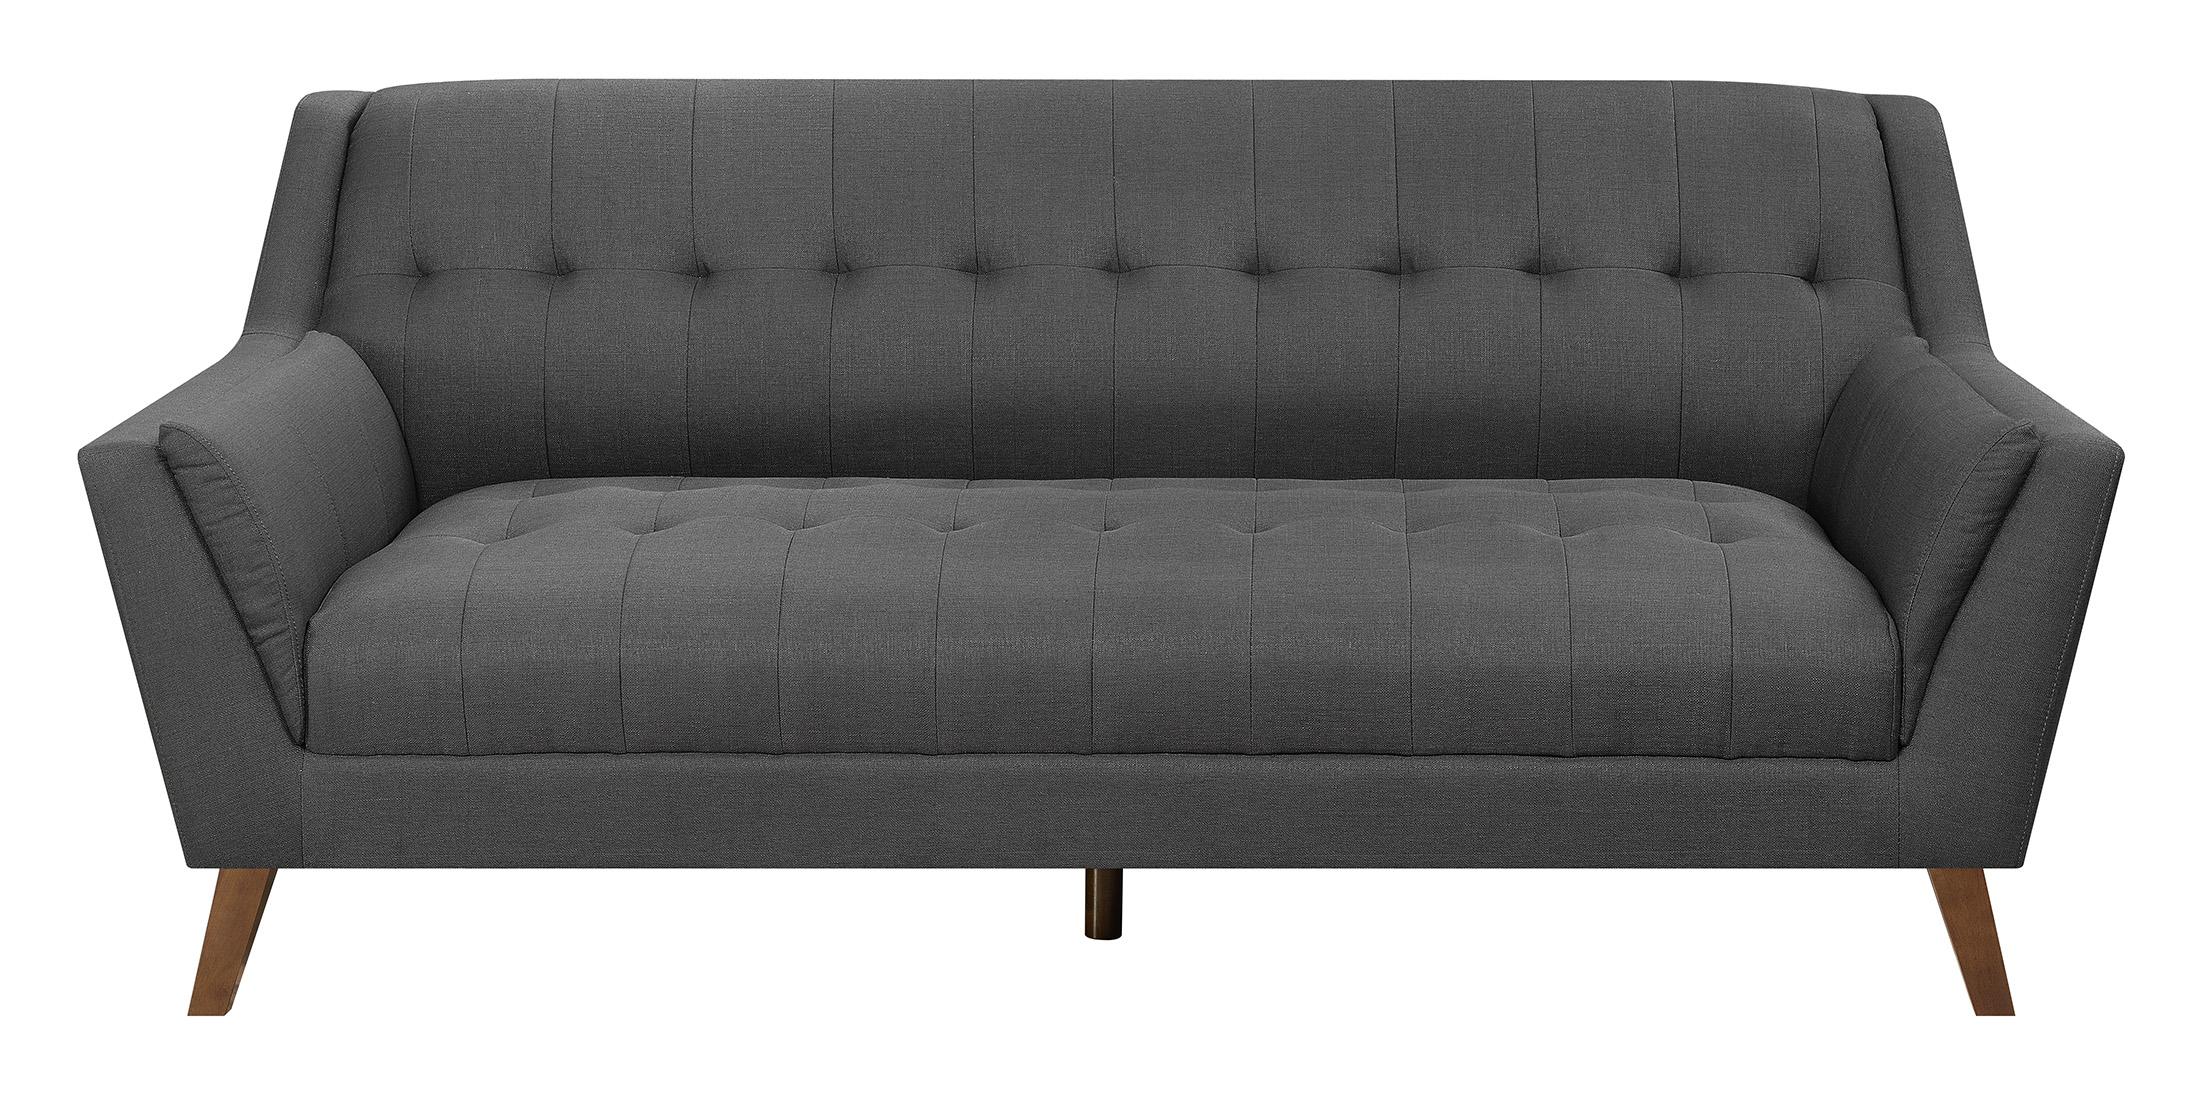 Belltown Sofa.jpg